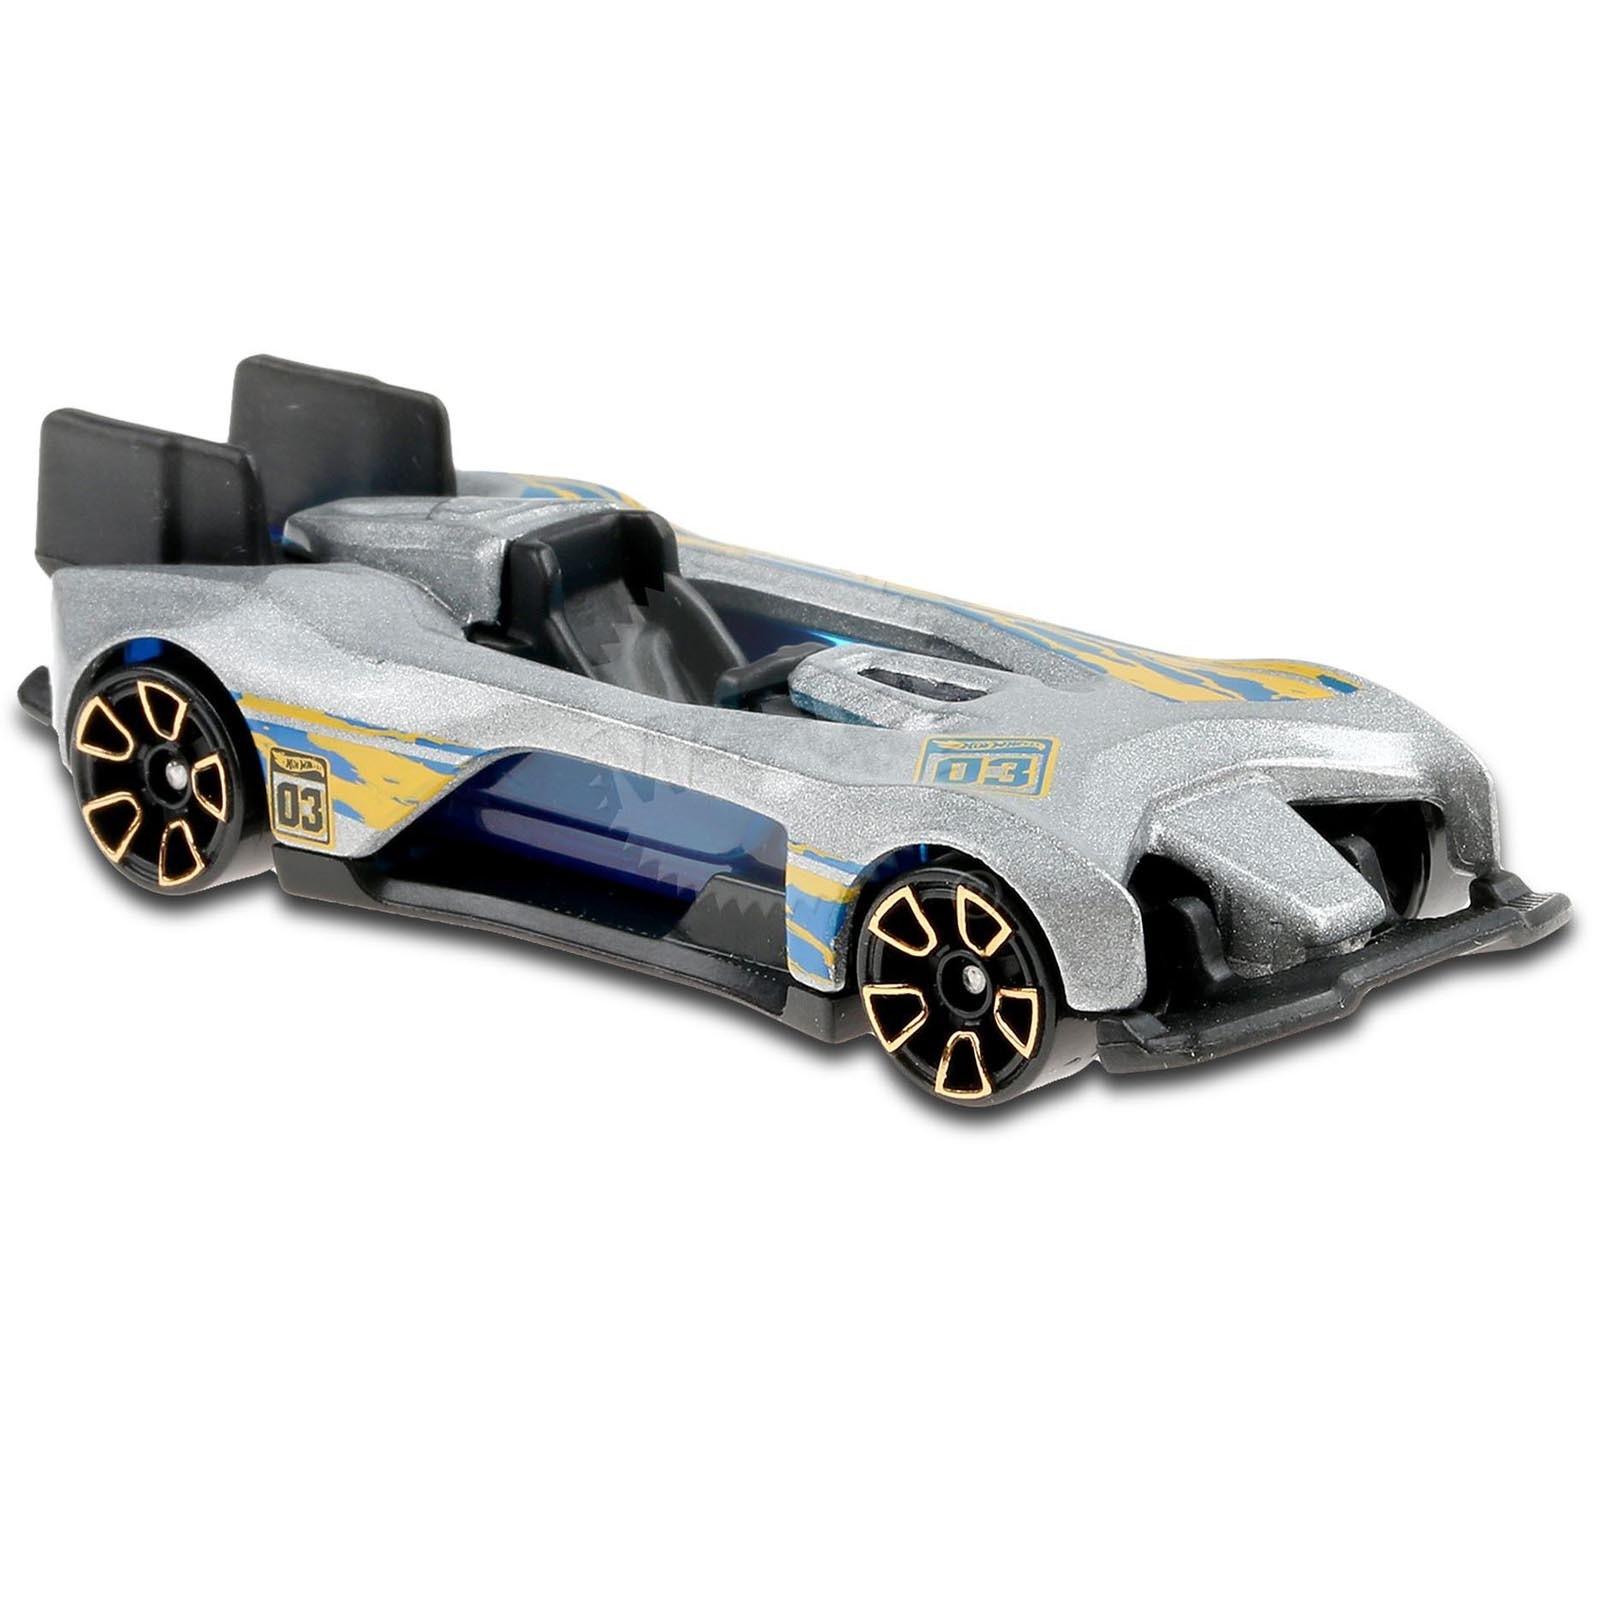 Carrinho Hot Wheels: Electro Silhouette ''Cinza'' (AR9EX) Hw Exotics - Mattel